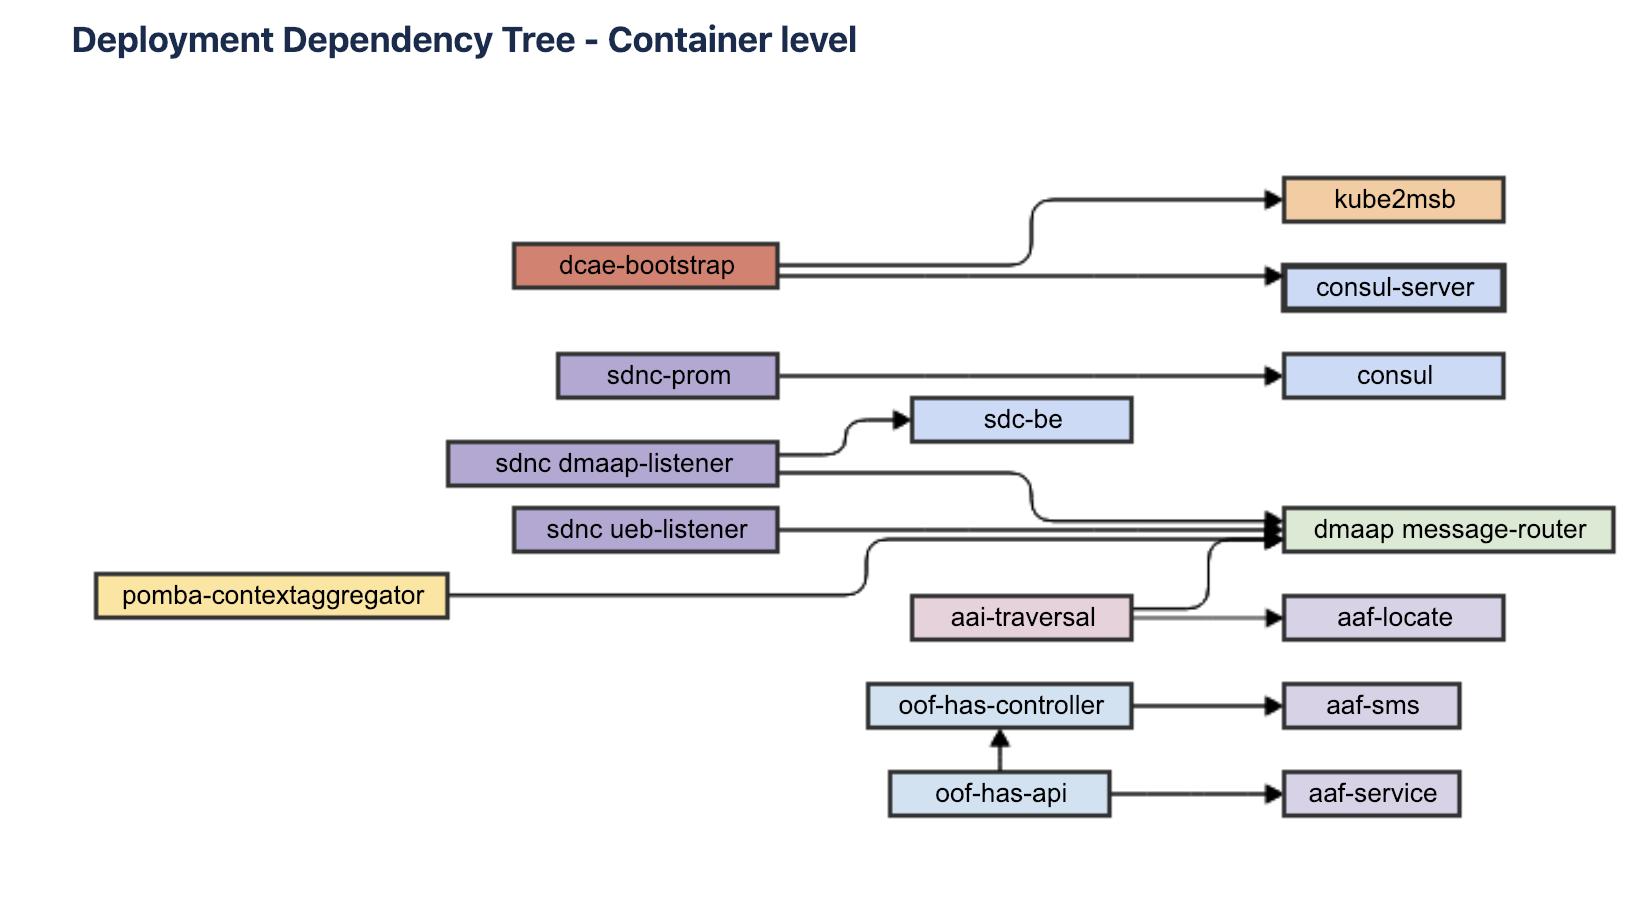 LOG-924] Kubernetes chart dependencies - make all 105 in 87 files